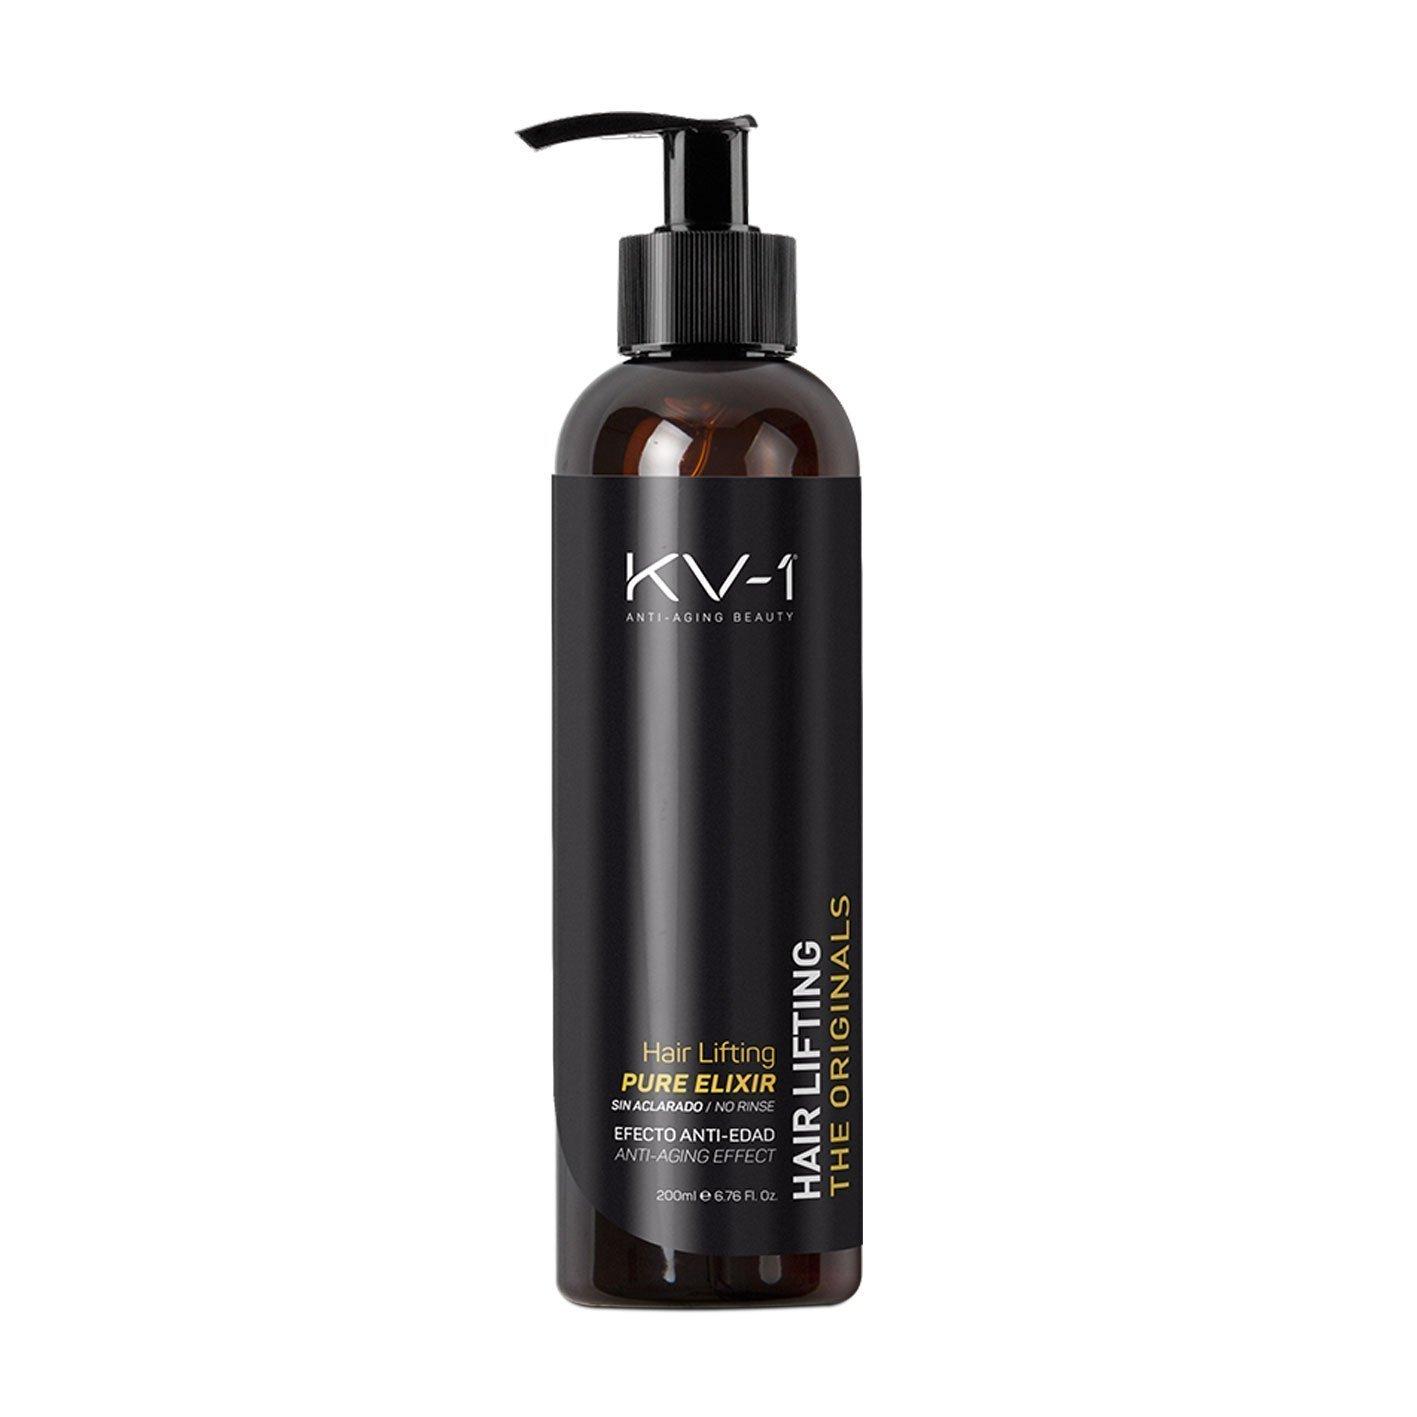 KV-1 Hair Lifting Pure Elixir Reestructurante capilar